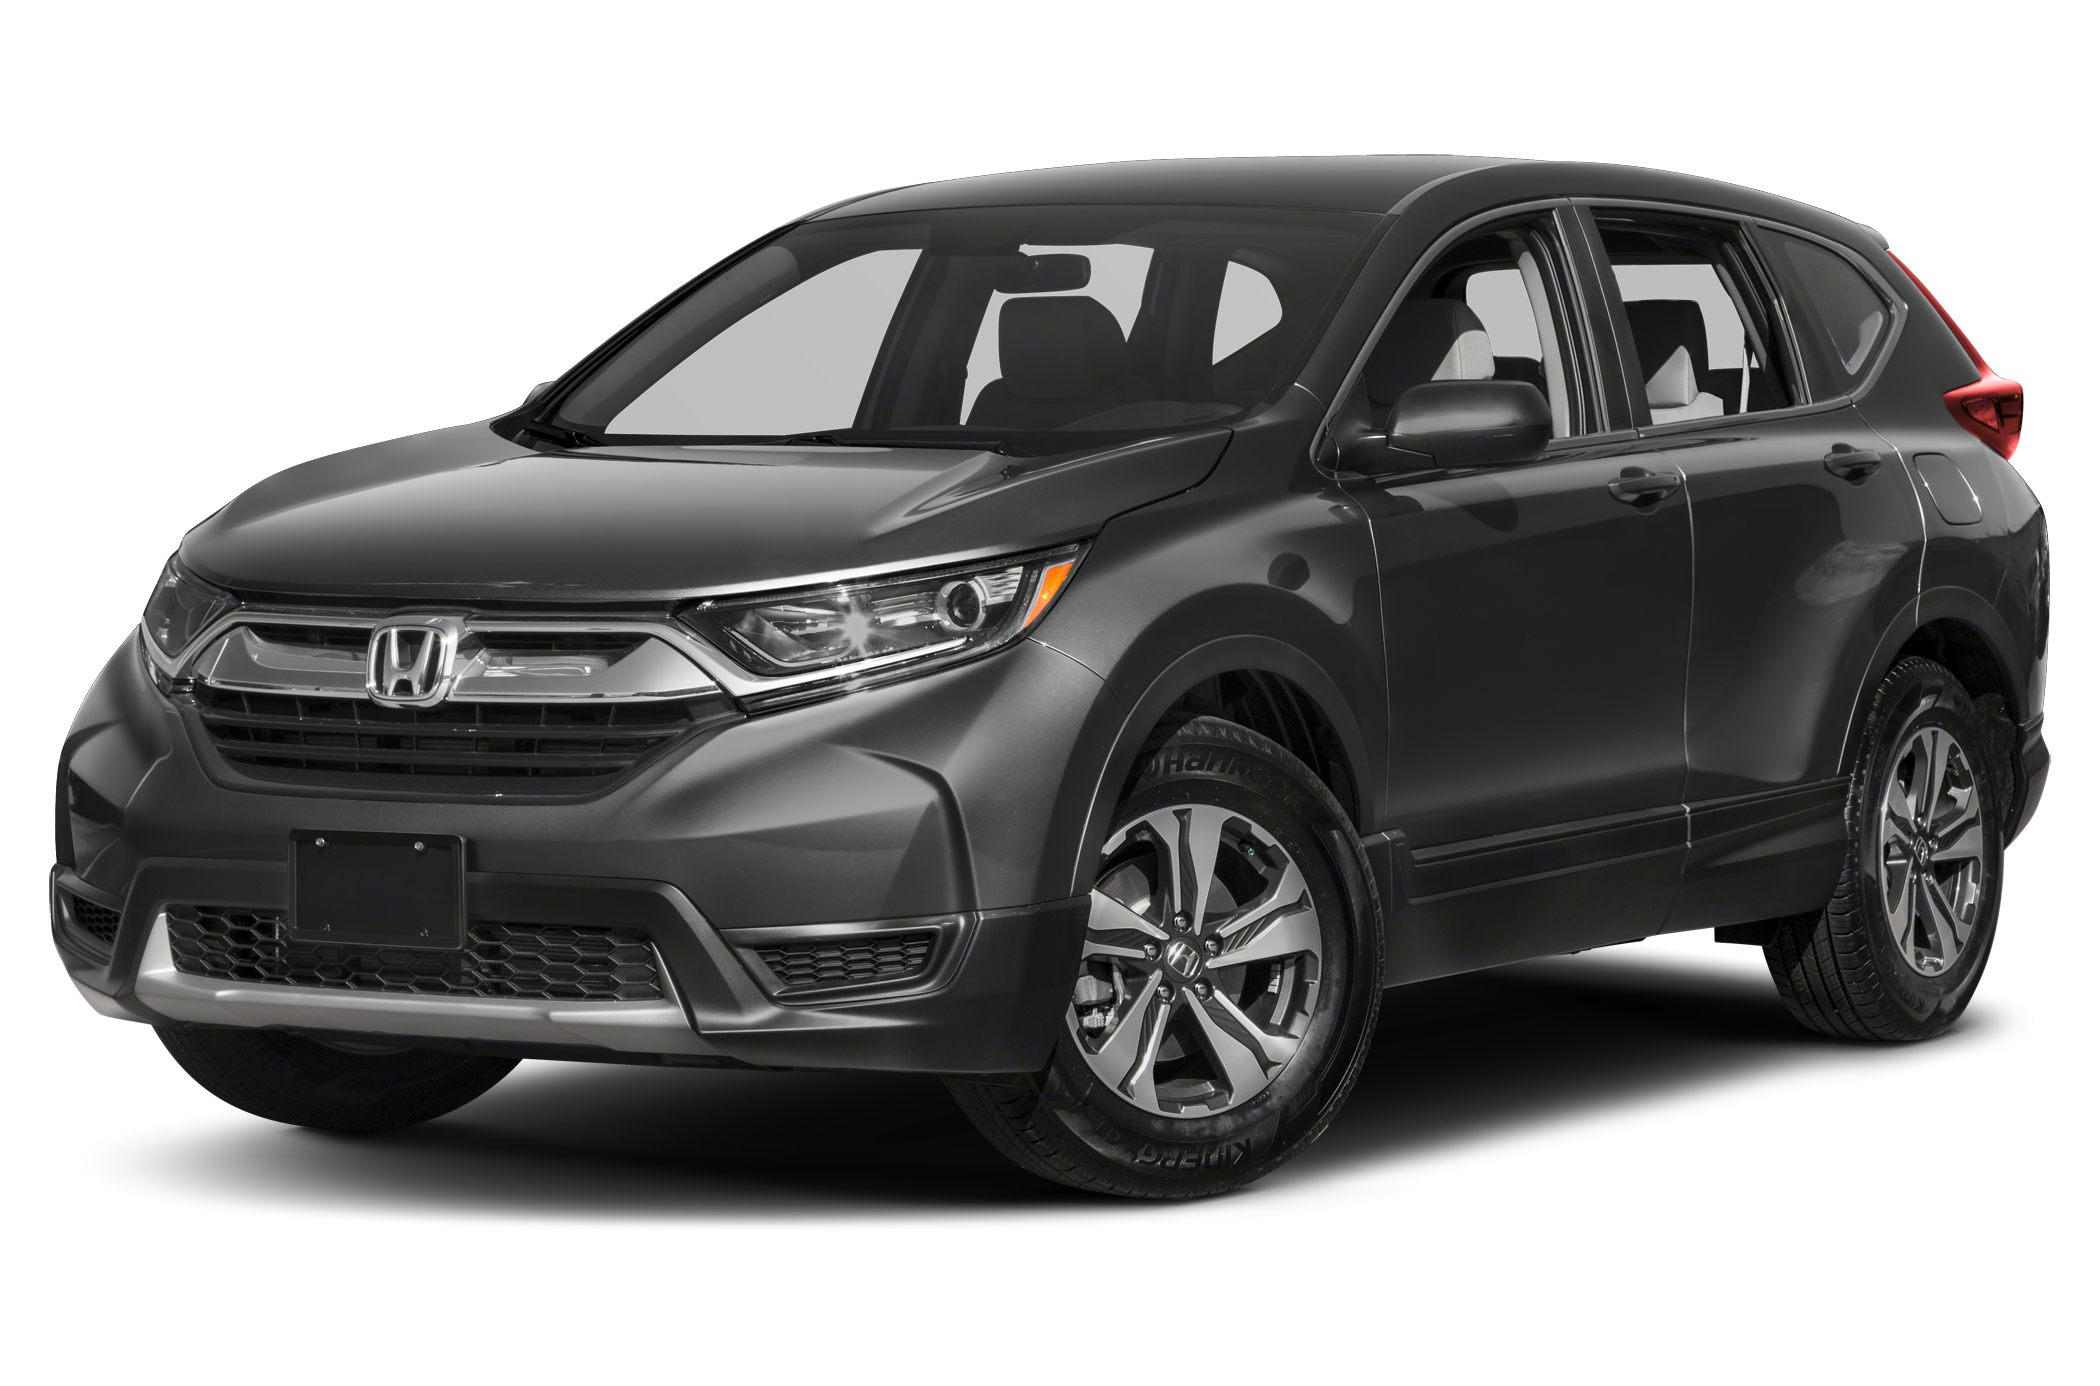 Honda Crv Lease >> 2017 Honda Cr V Styles Features Highlights